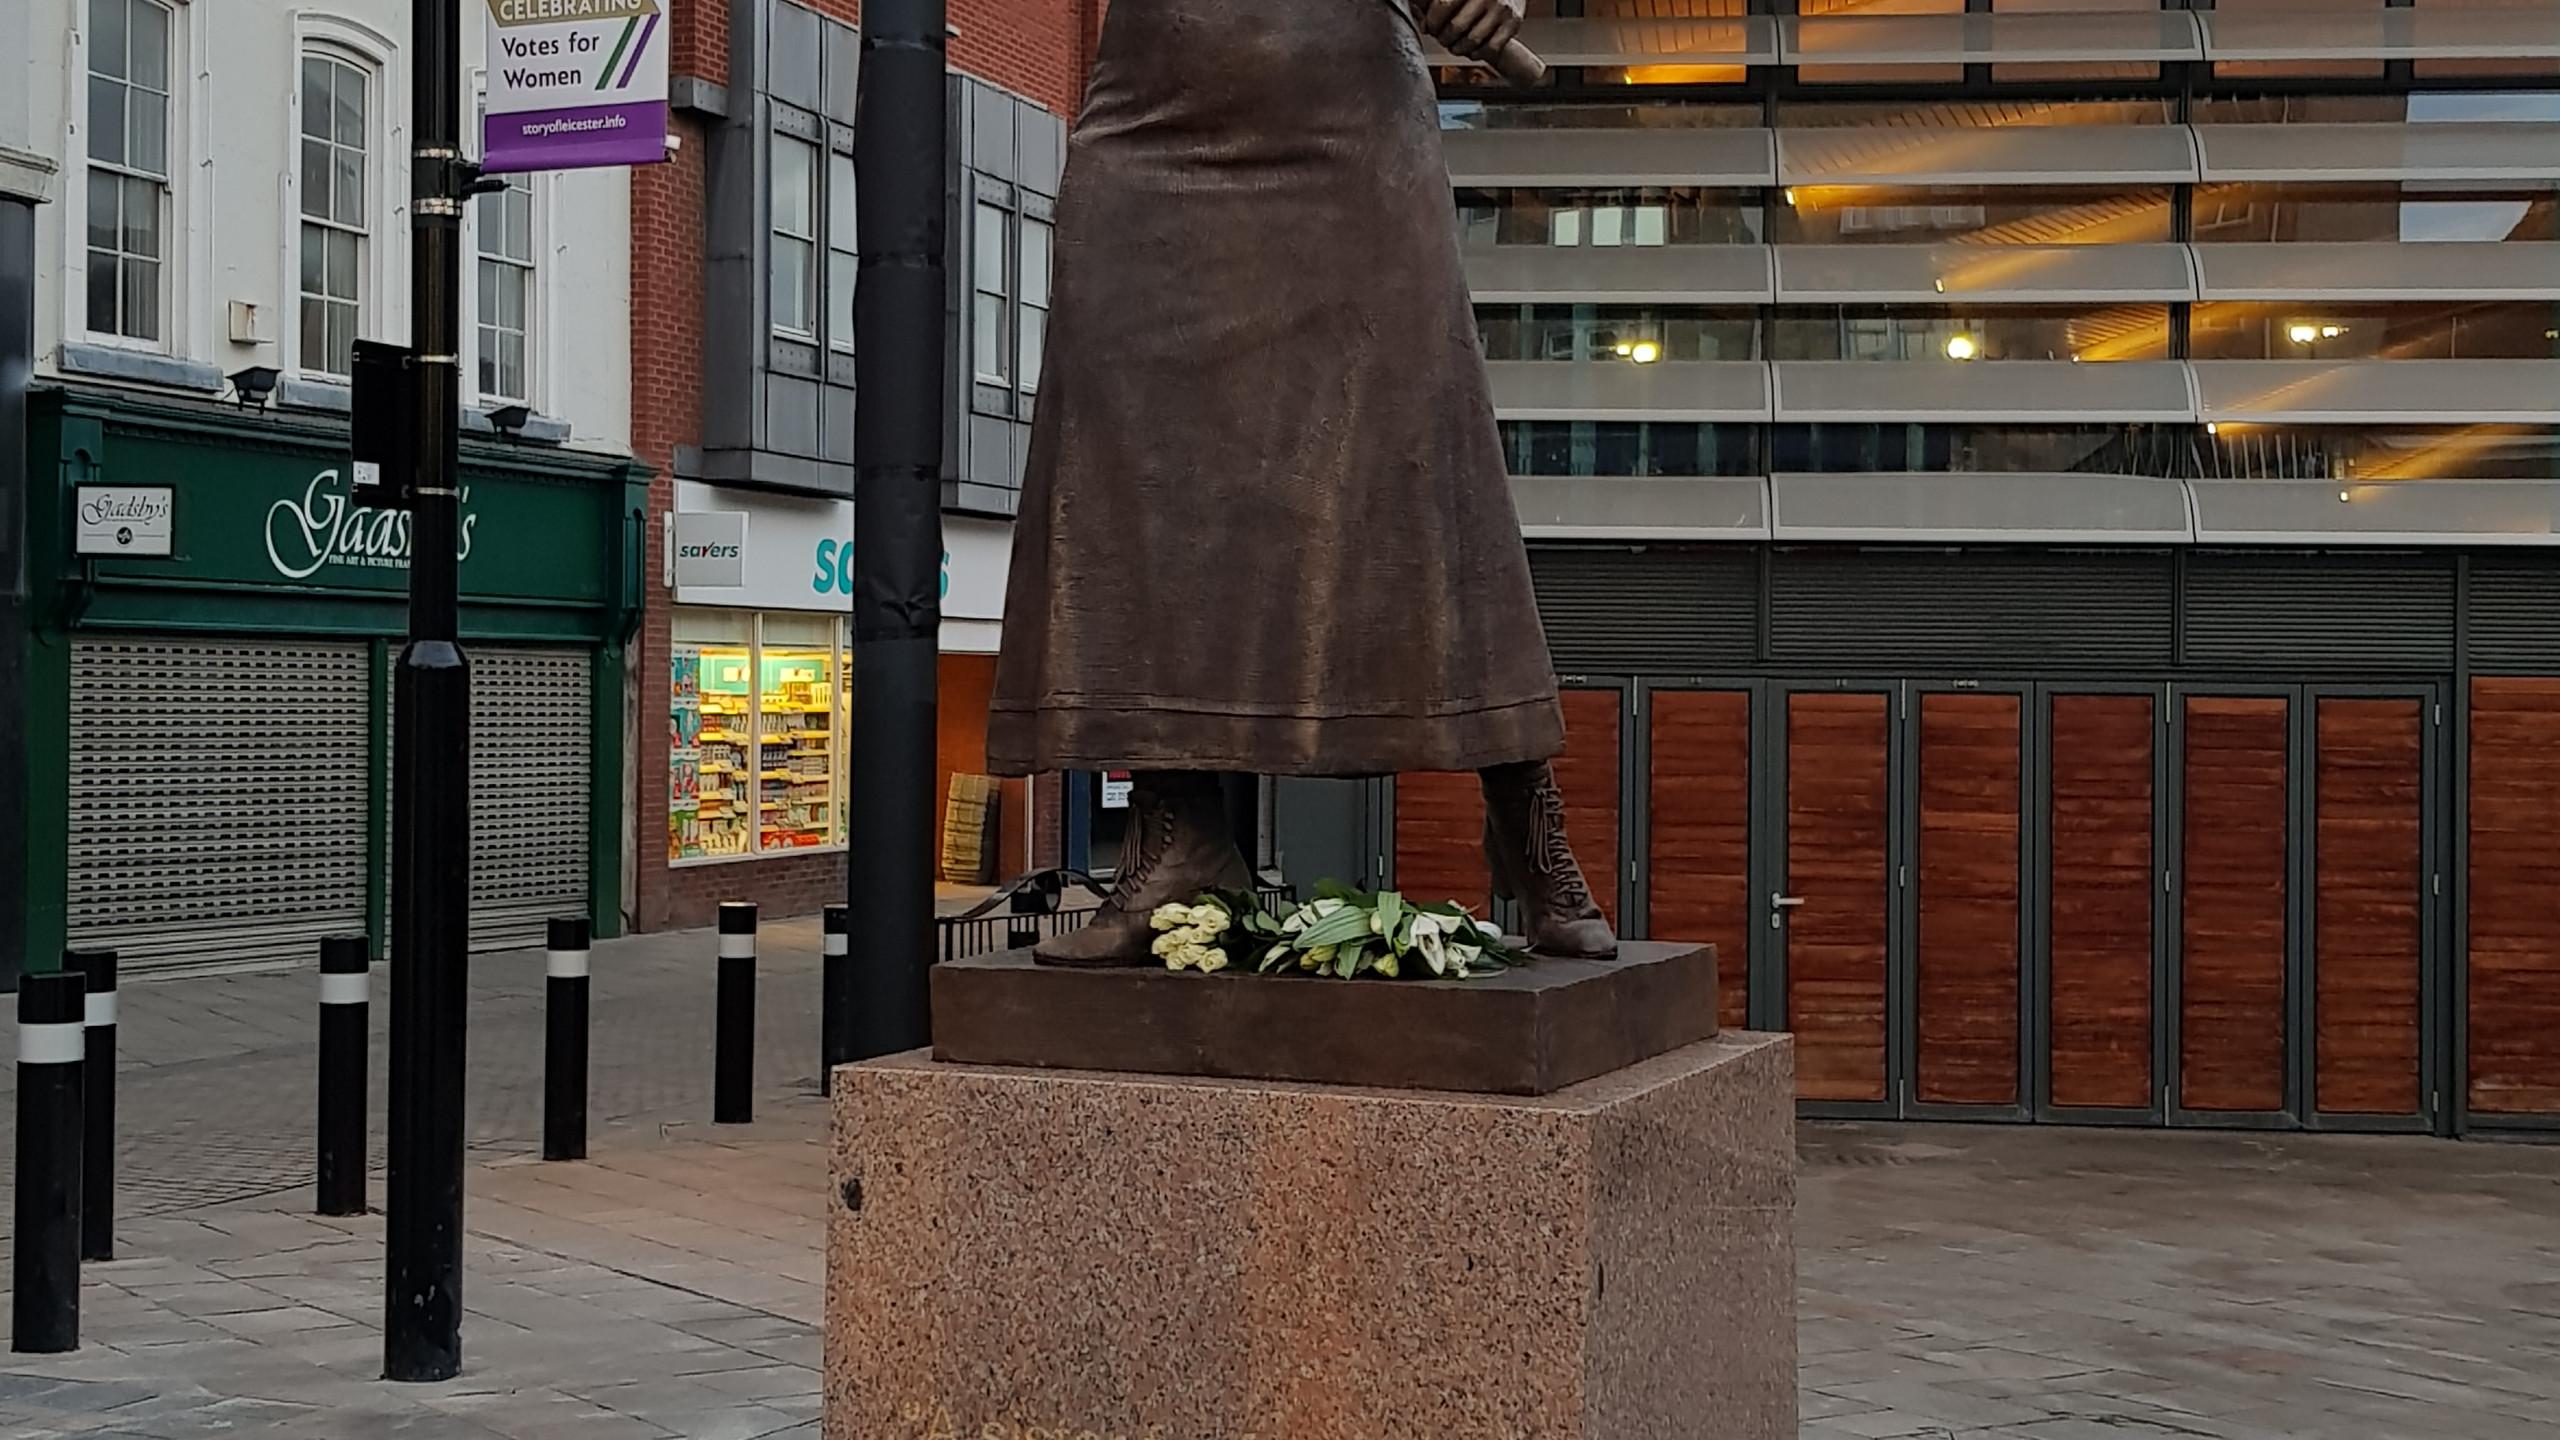 Suffragette Alice Hawkins